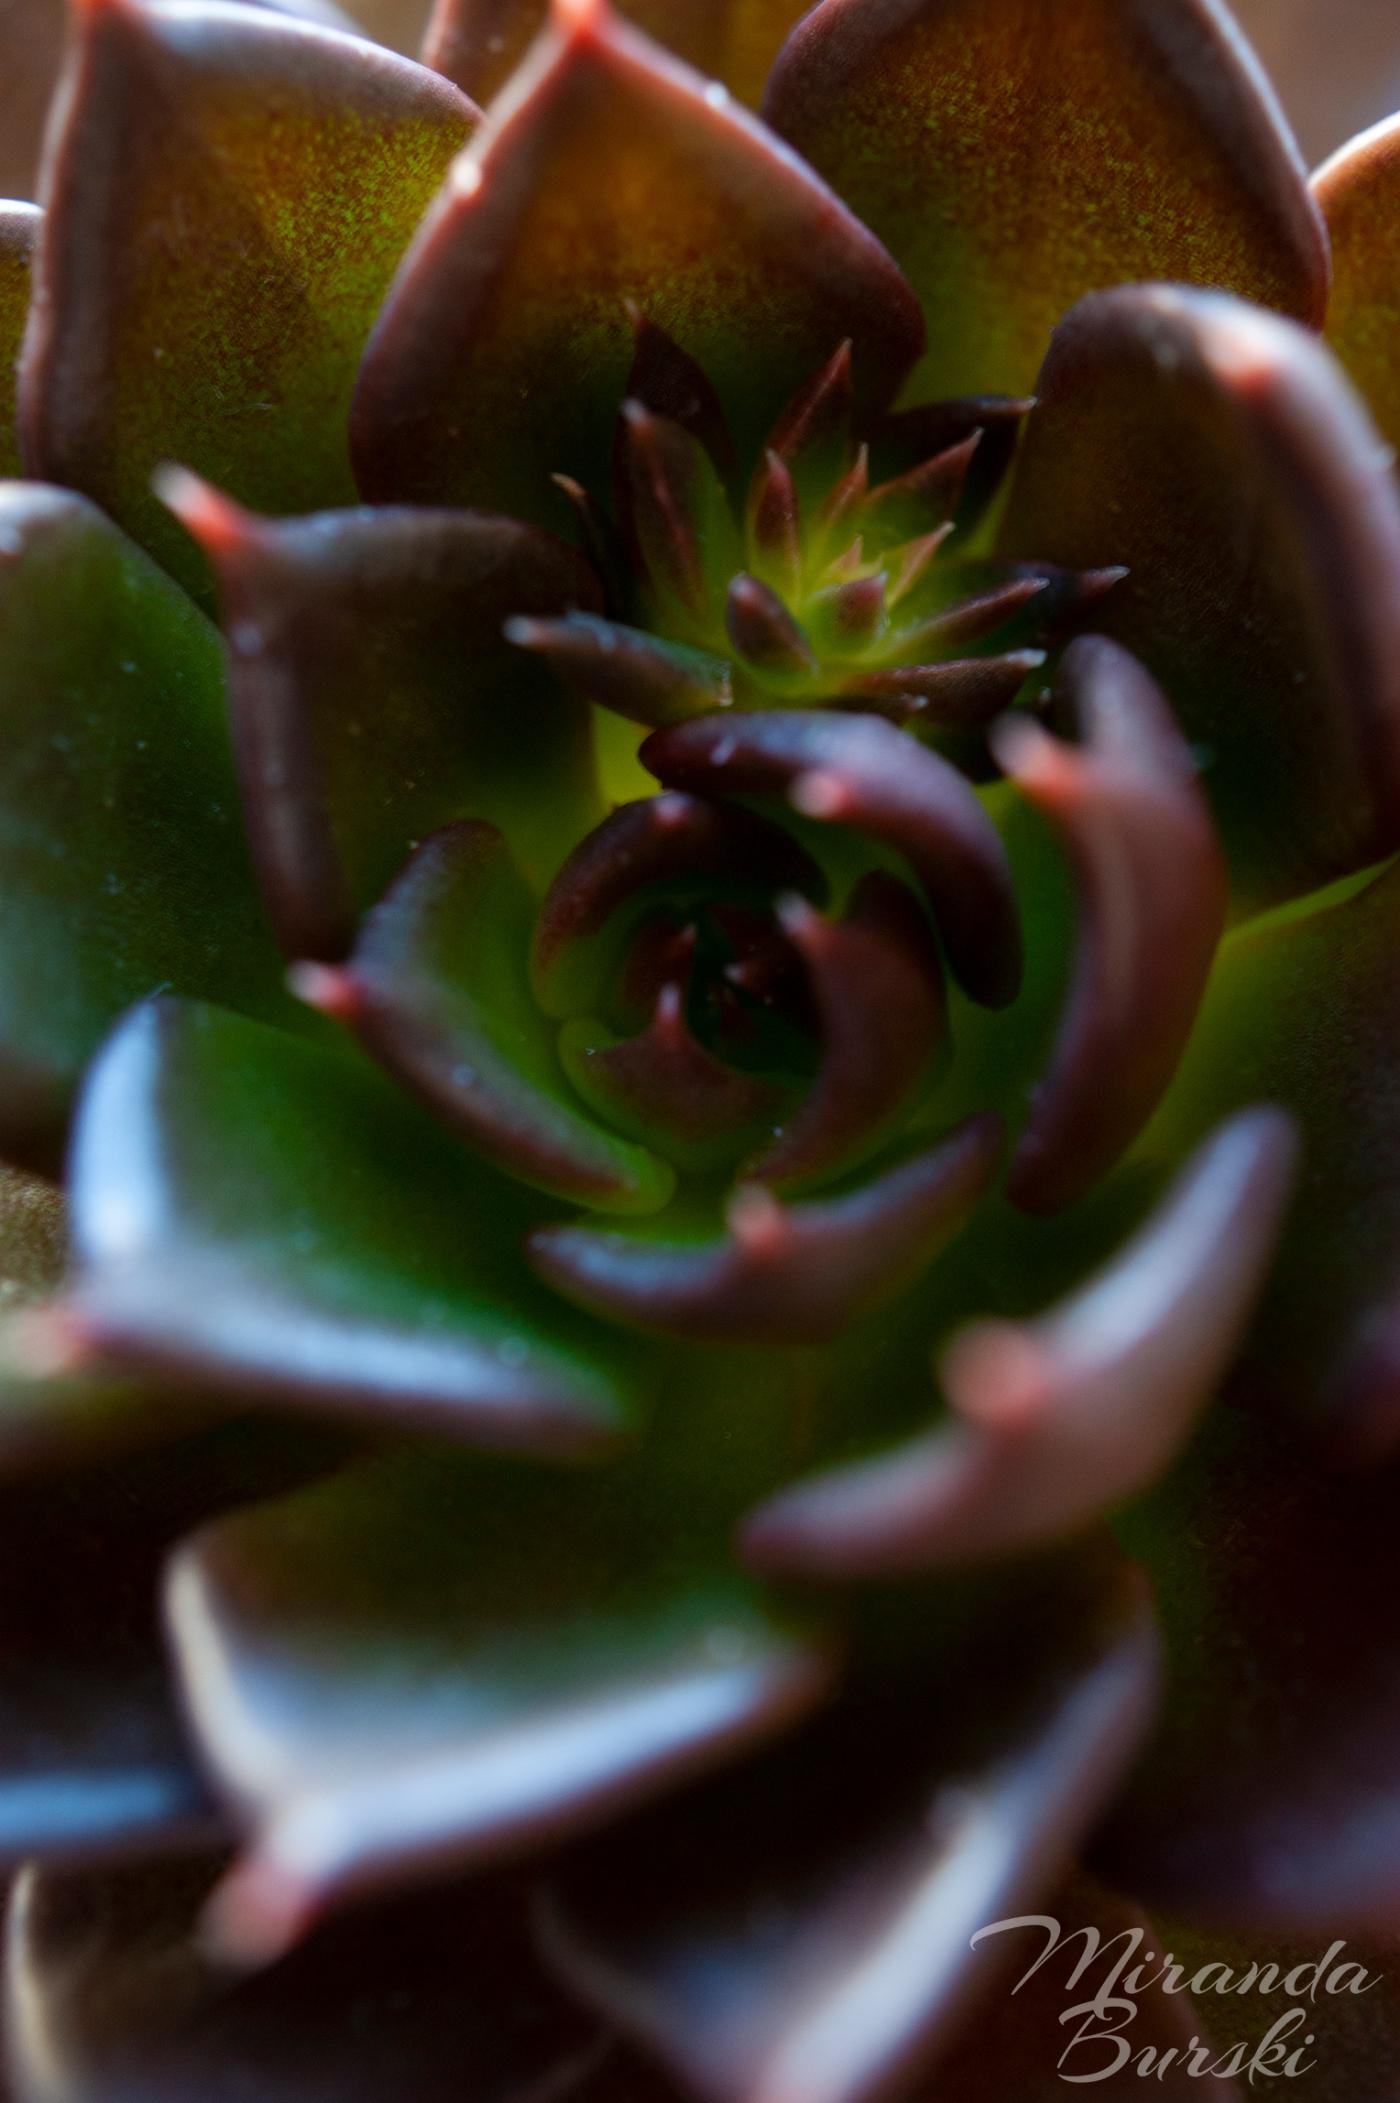 A close-up of a Black Prince succulent.